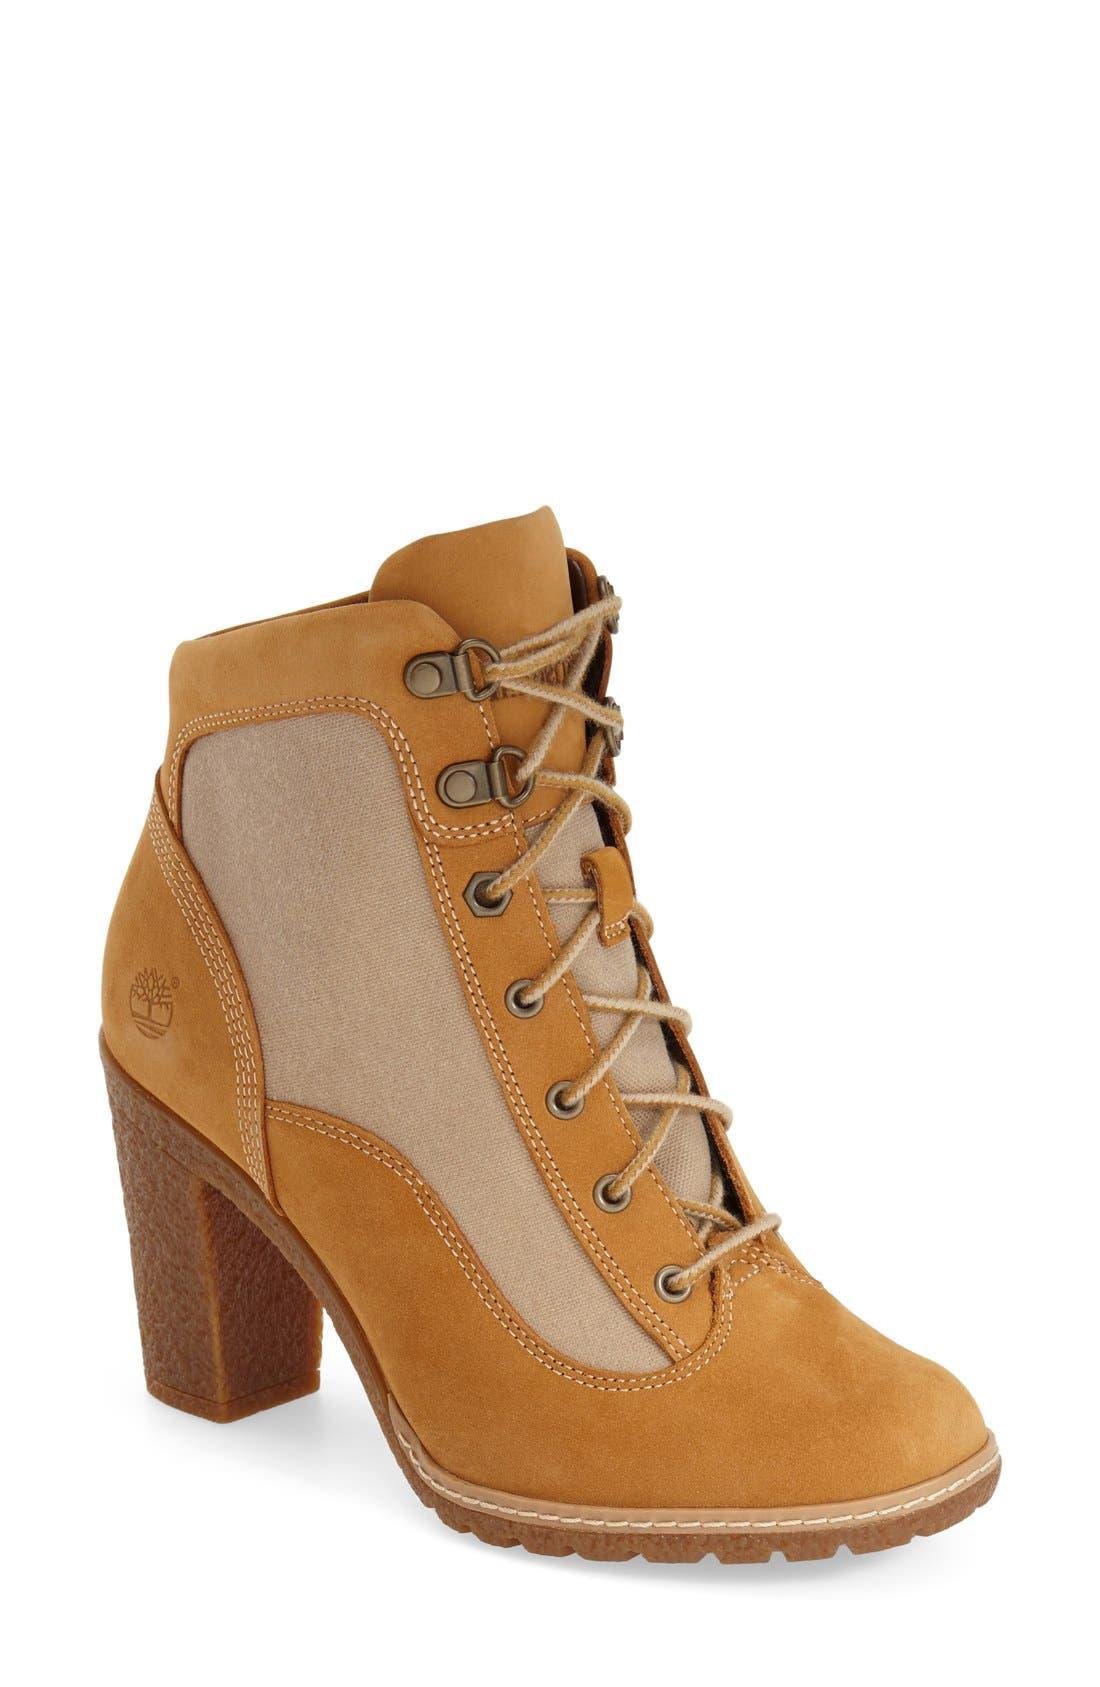 Alternate Image 1 Selected - Timberland 'GlancyHiker' Boot (Women)